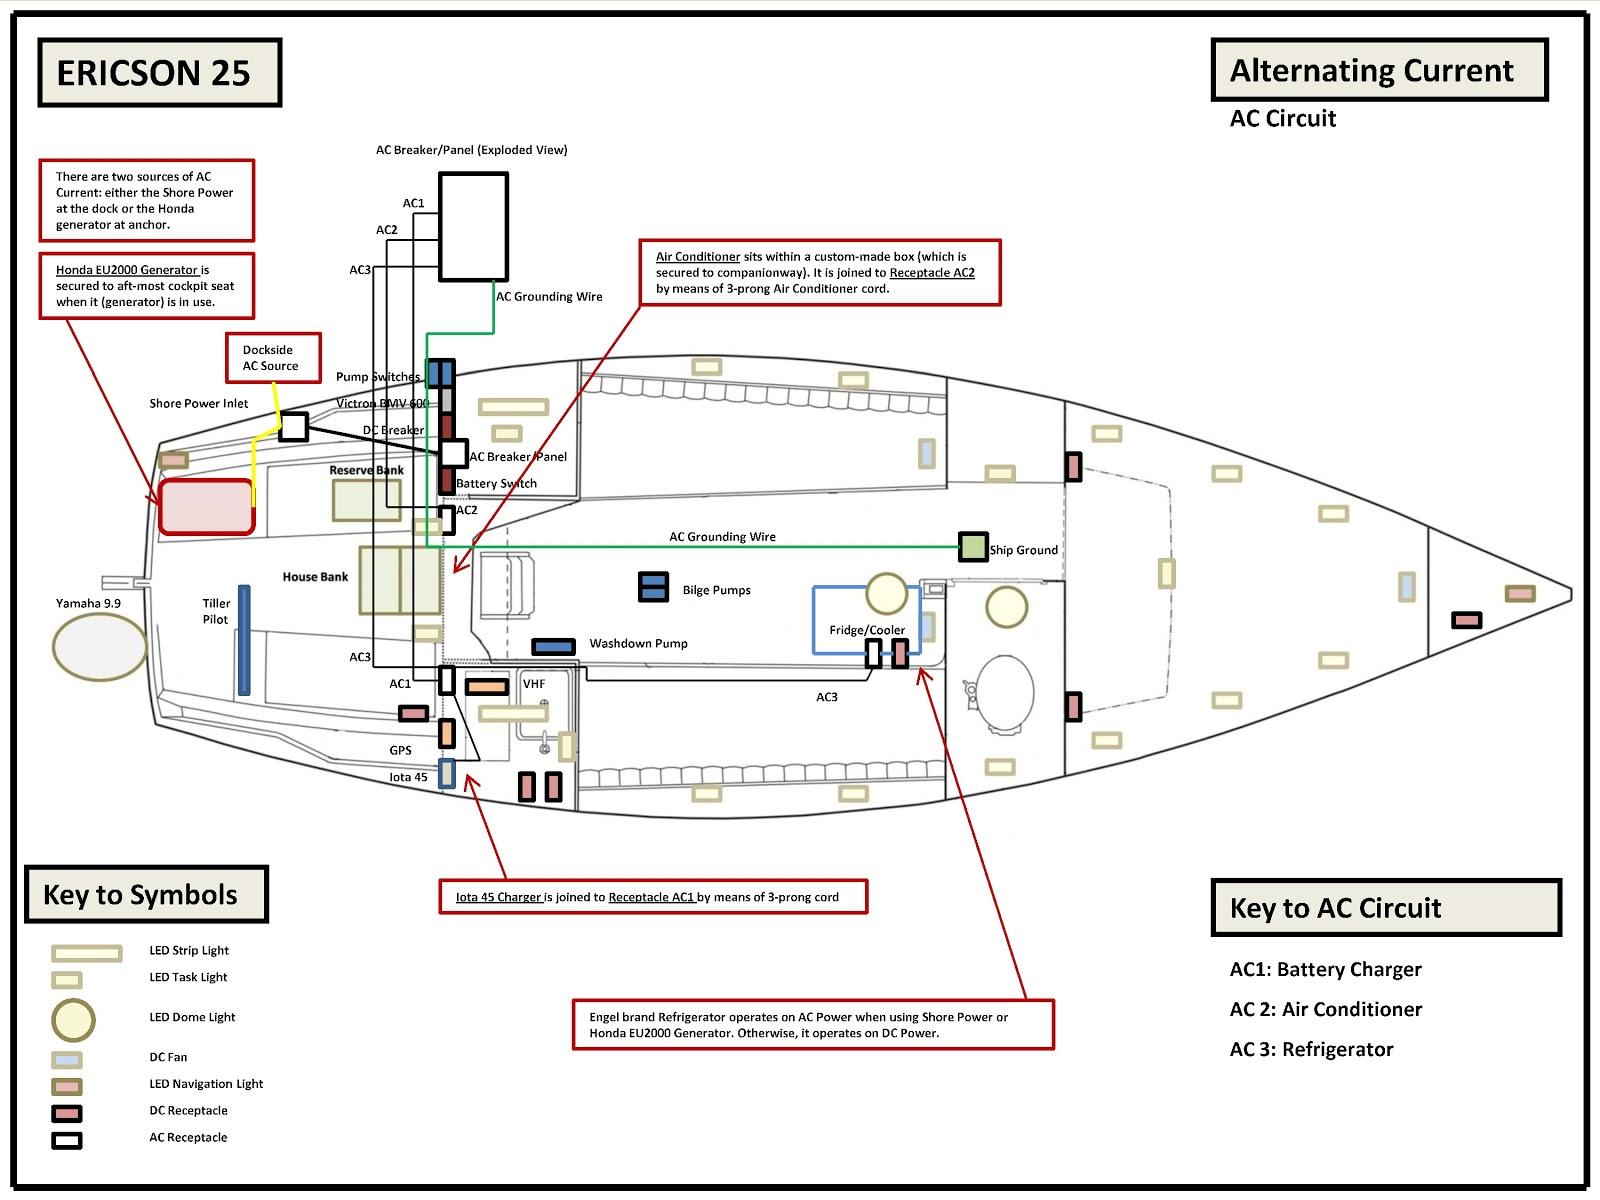 Ericson 25, Oystercatcher: Electrical Diagram, New, AC Circuit